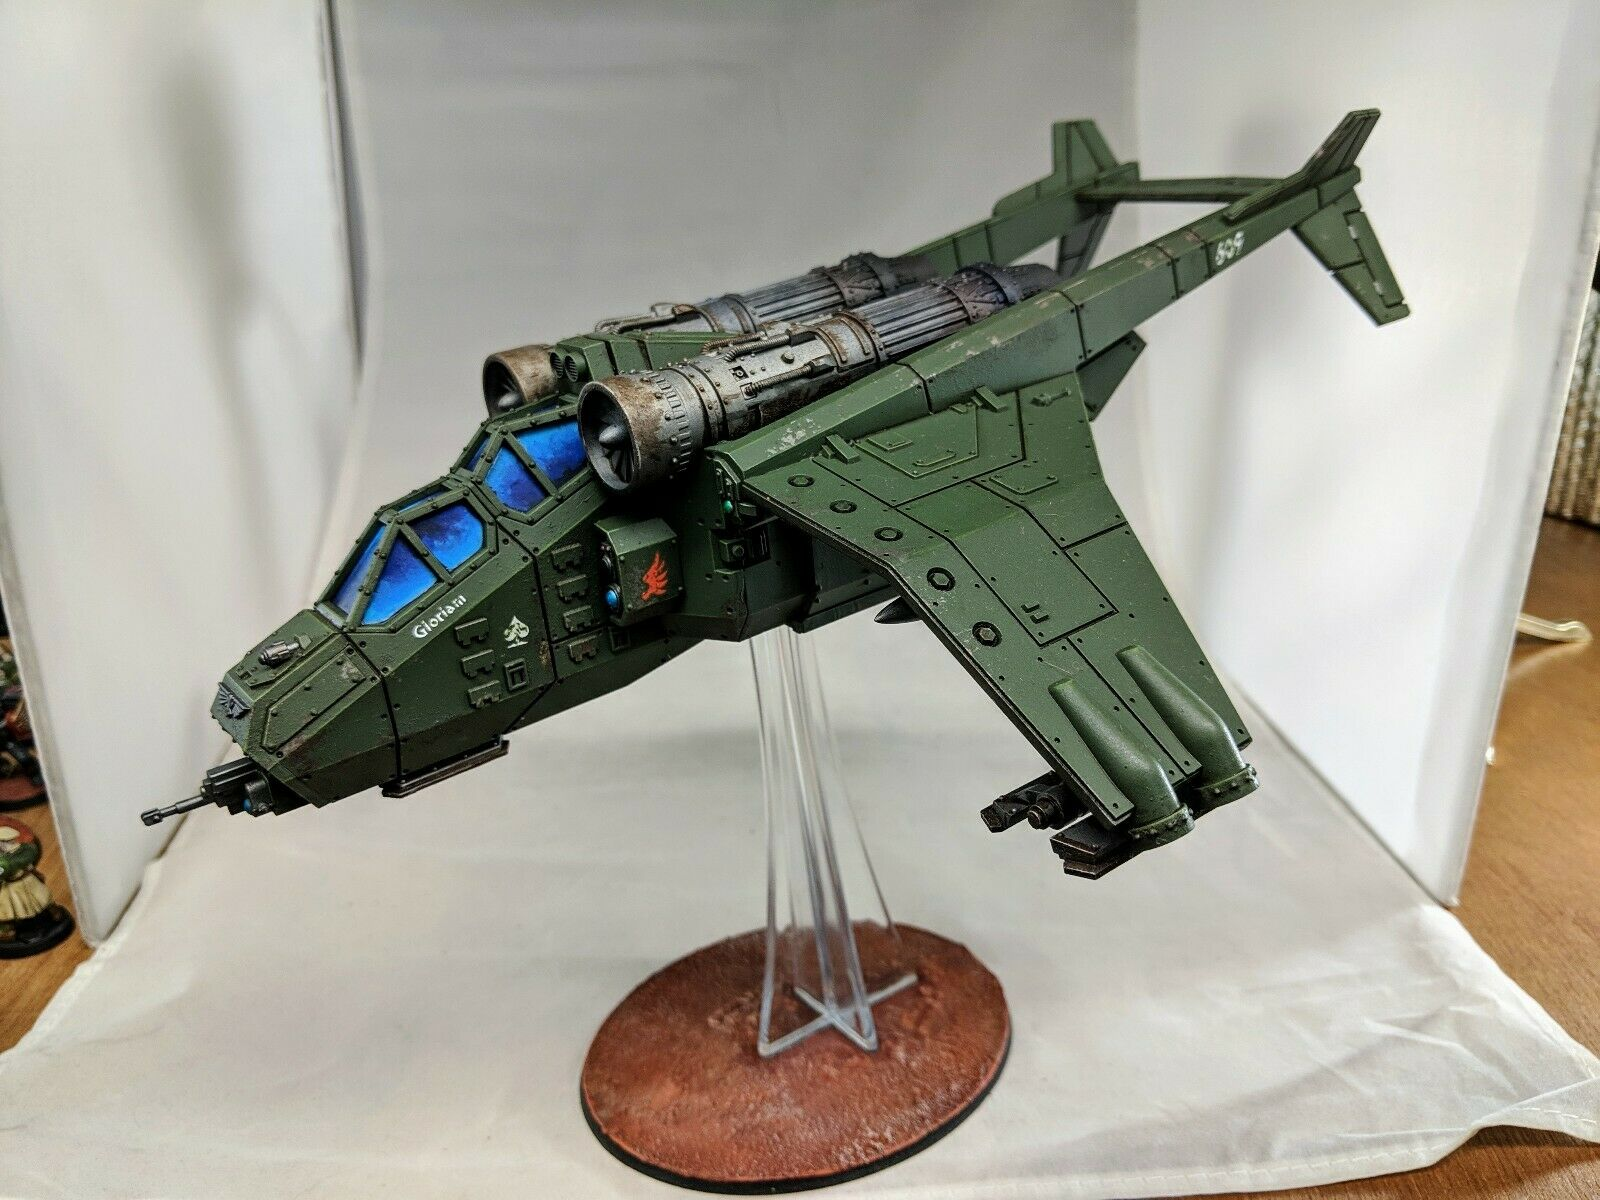 Warhammer 40k-Astra Militarum Valkyrie-pintado y magnetizado magnetizado magnetizado  Felices compras